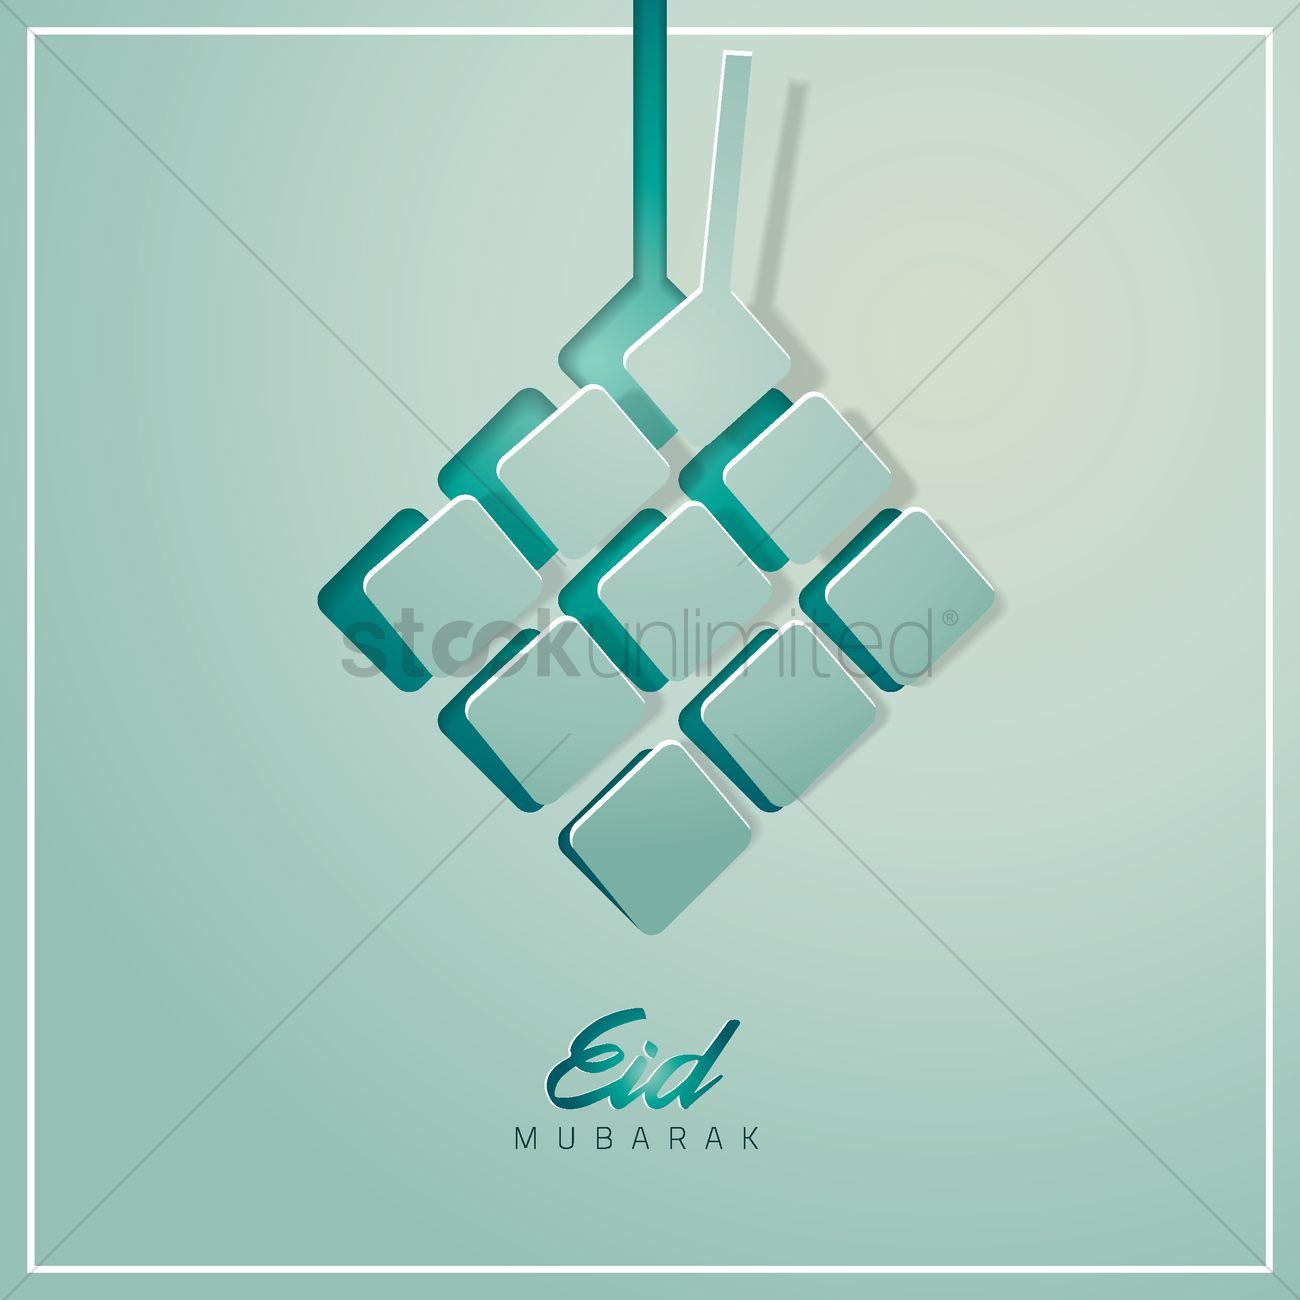 Eid Mubarak Greeting Vector Image 1828221 Stockunlimited